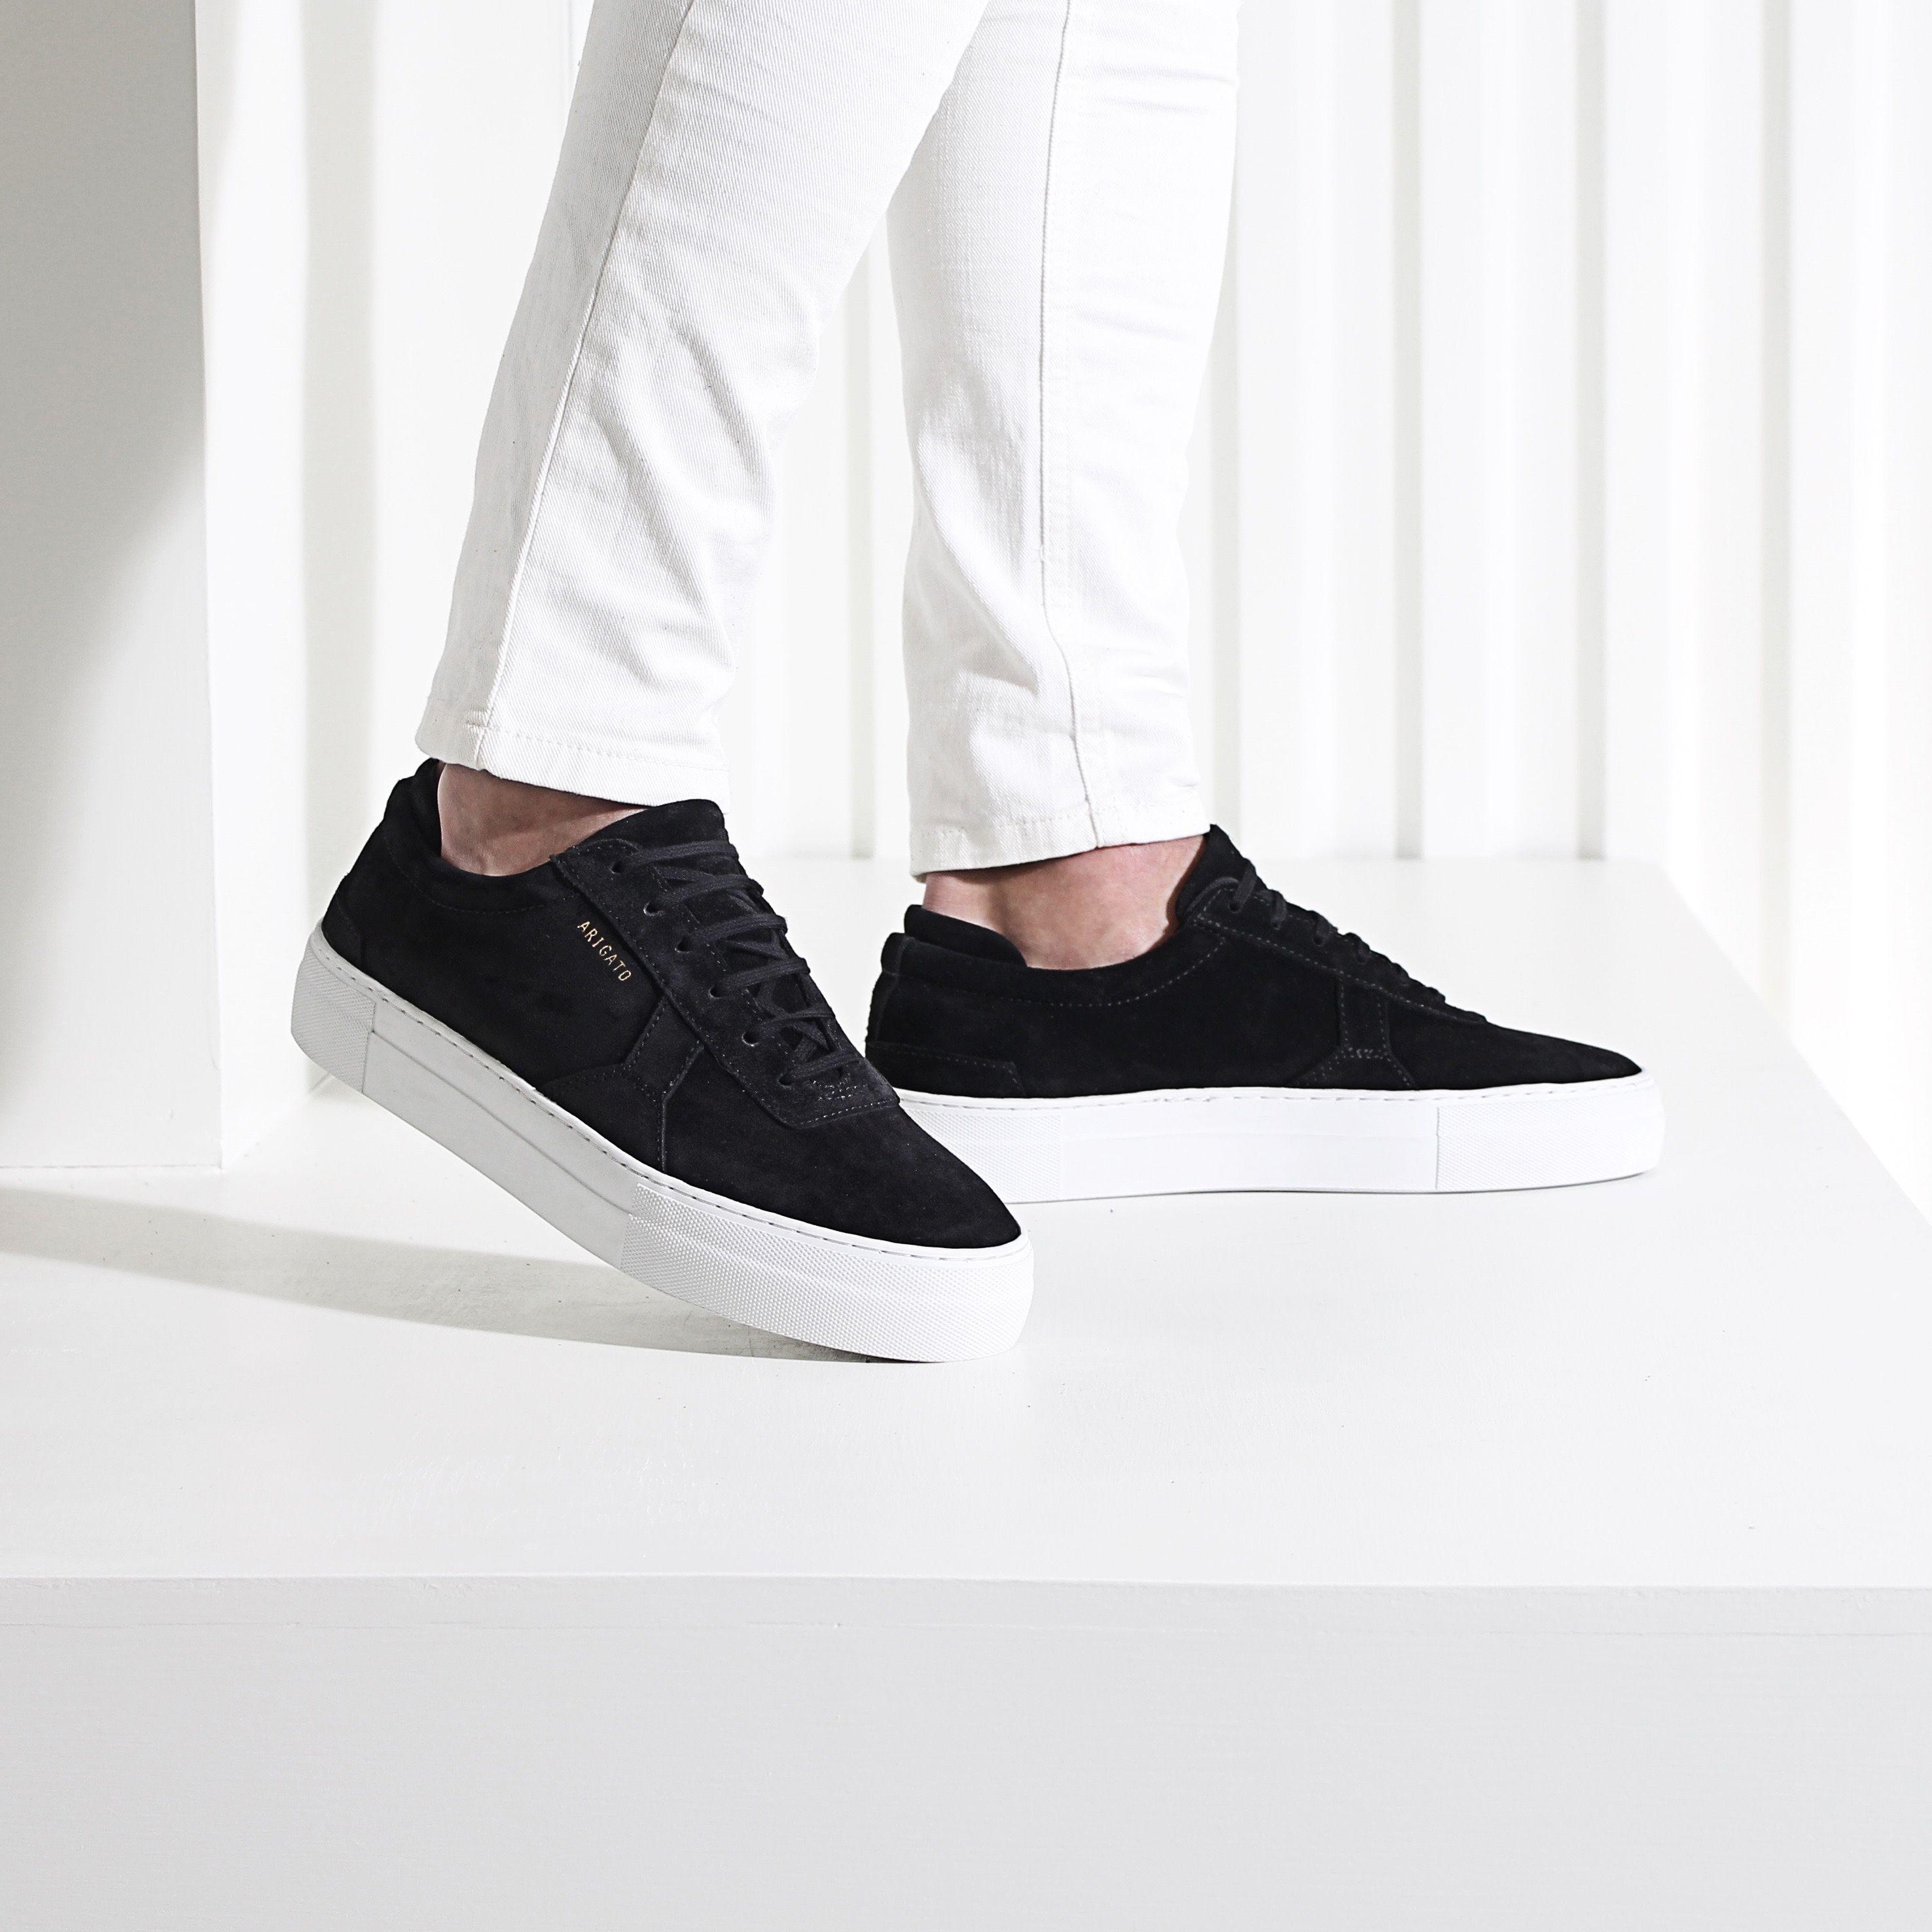 Black suede platform sneaker from Axel